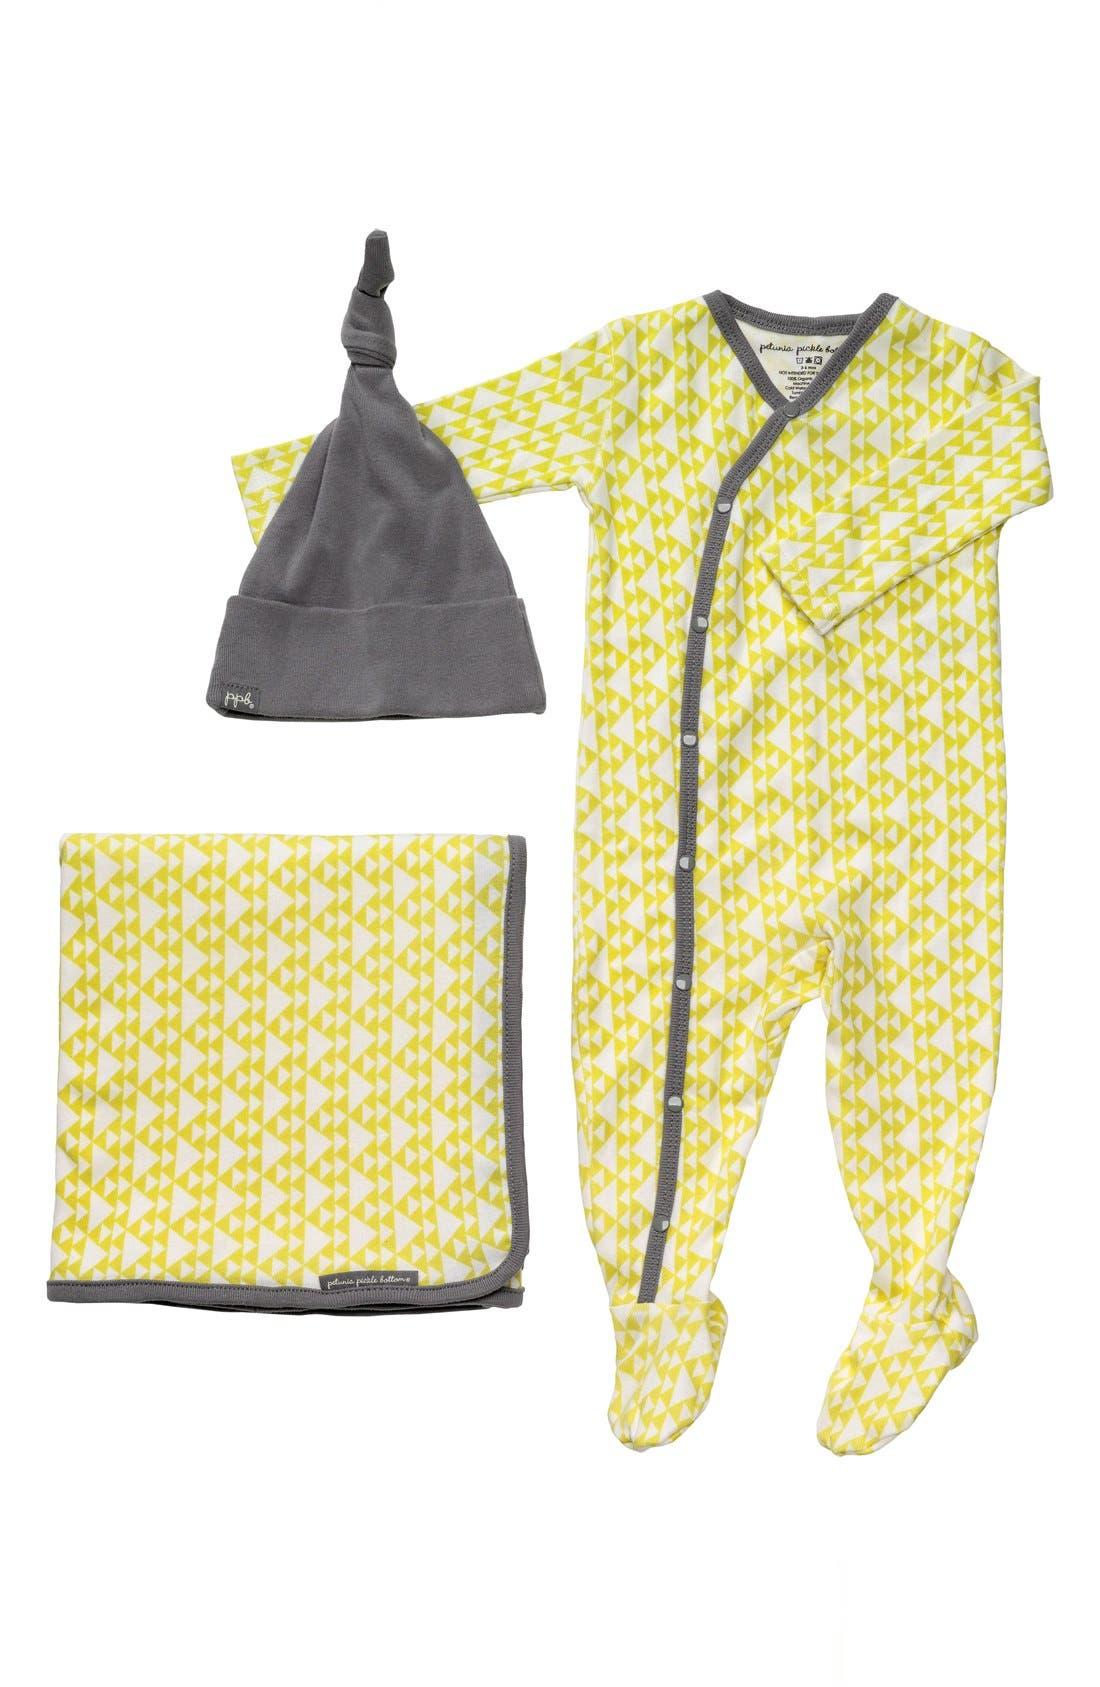 Alternate Image 1 Selected - Petunia Pickle Bottom 'Snuggle' Footie, Blanket & Hat Set (Infant)